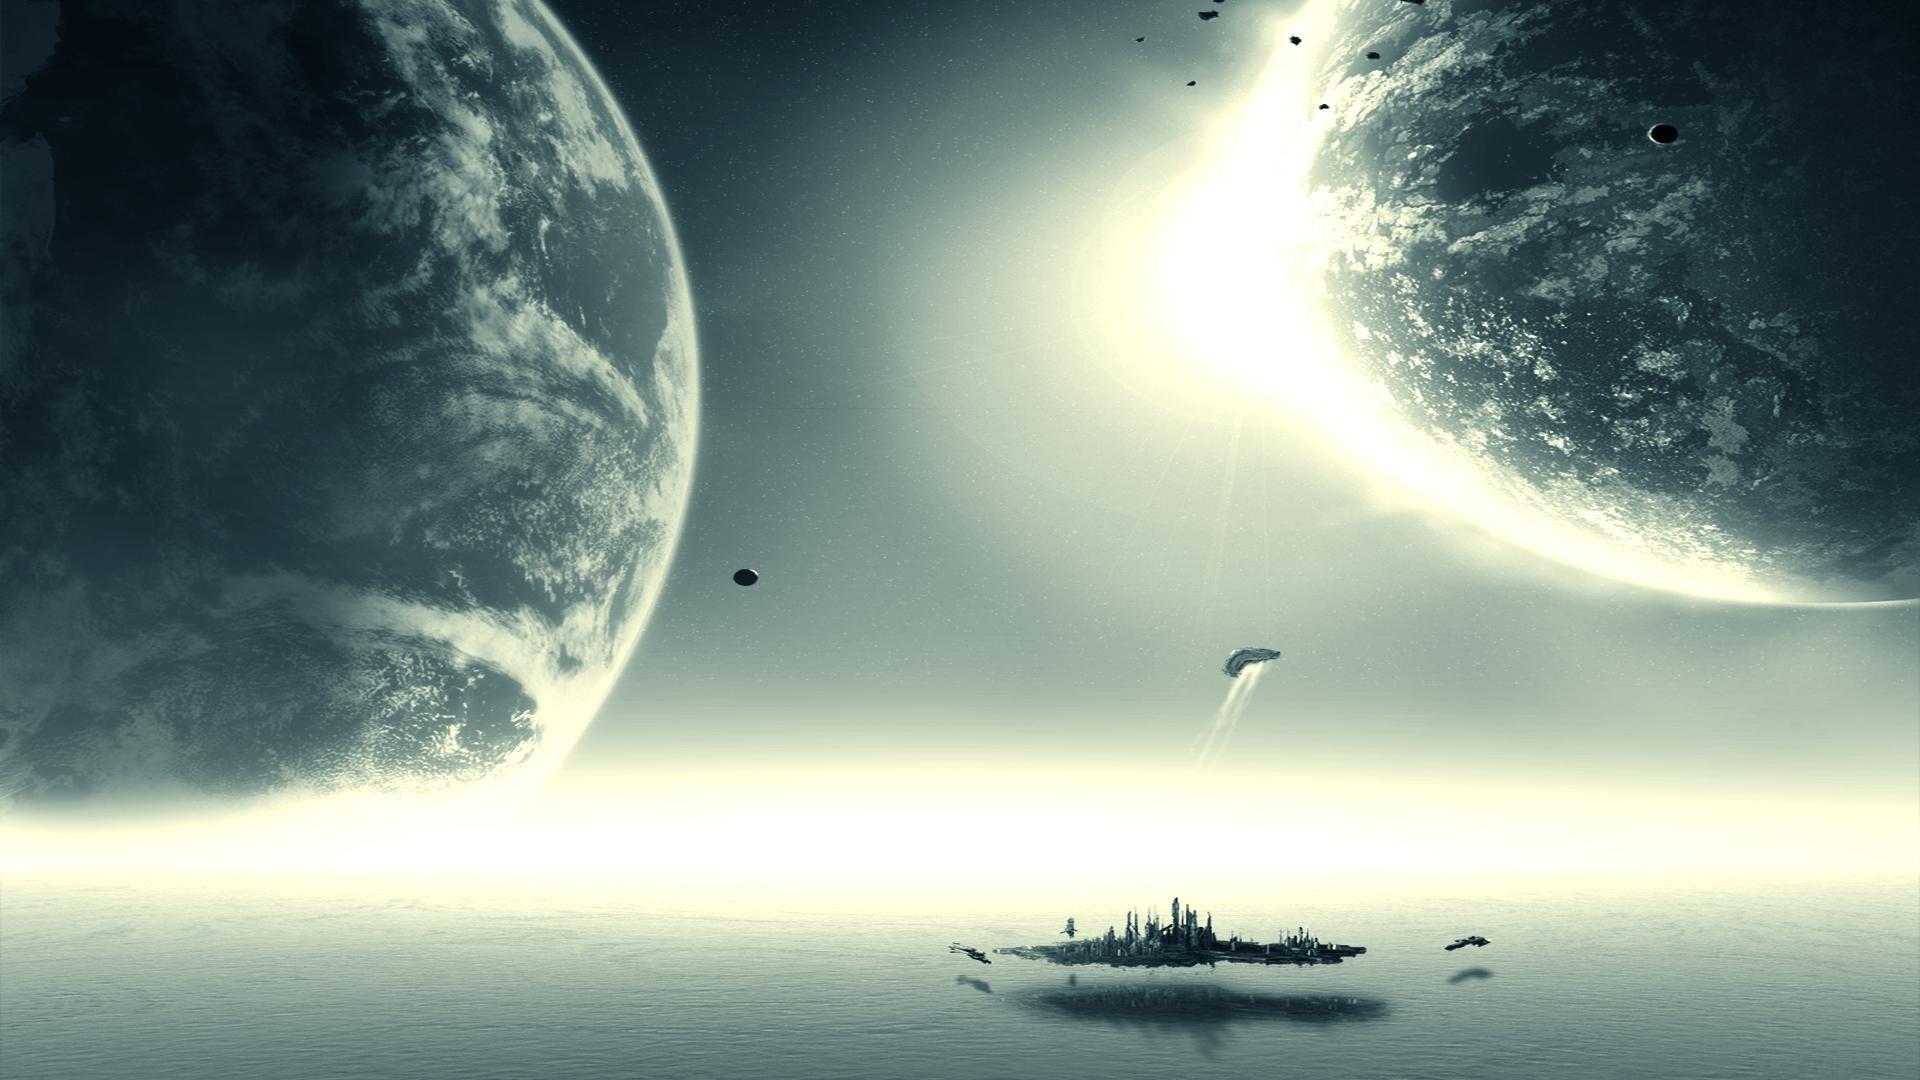 General 1920x1080 science fiction space art digital art Stargate Stargate Atlantis jumper Daedalus-class TV Series